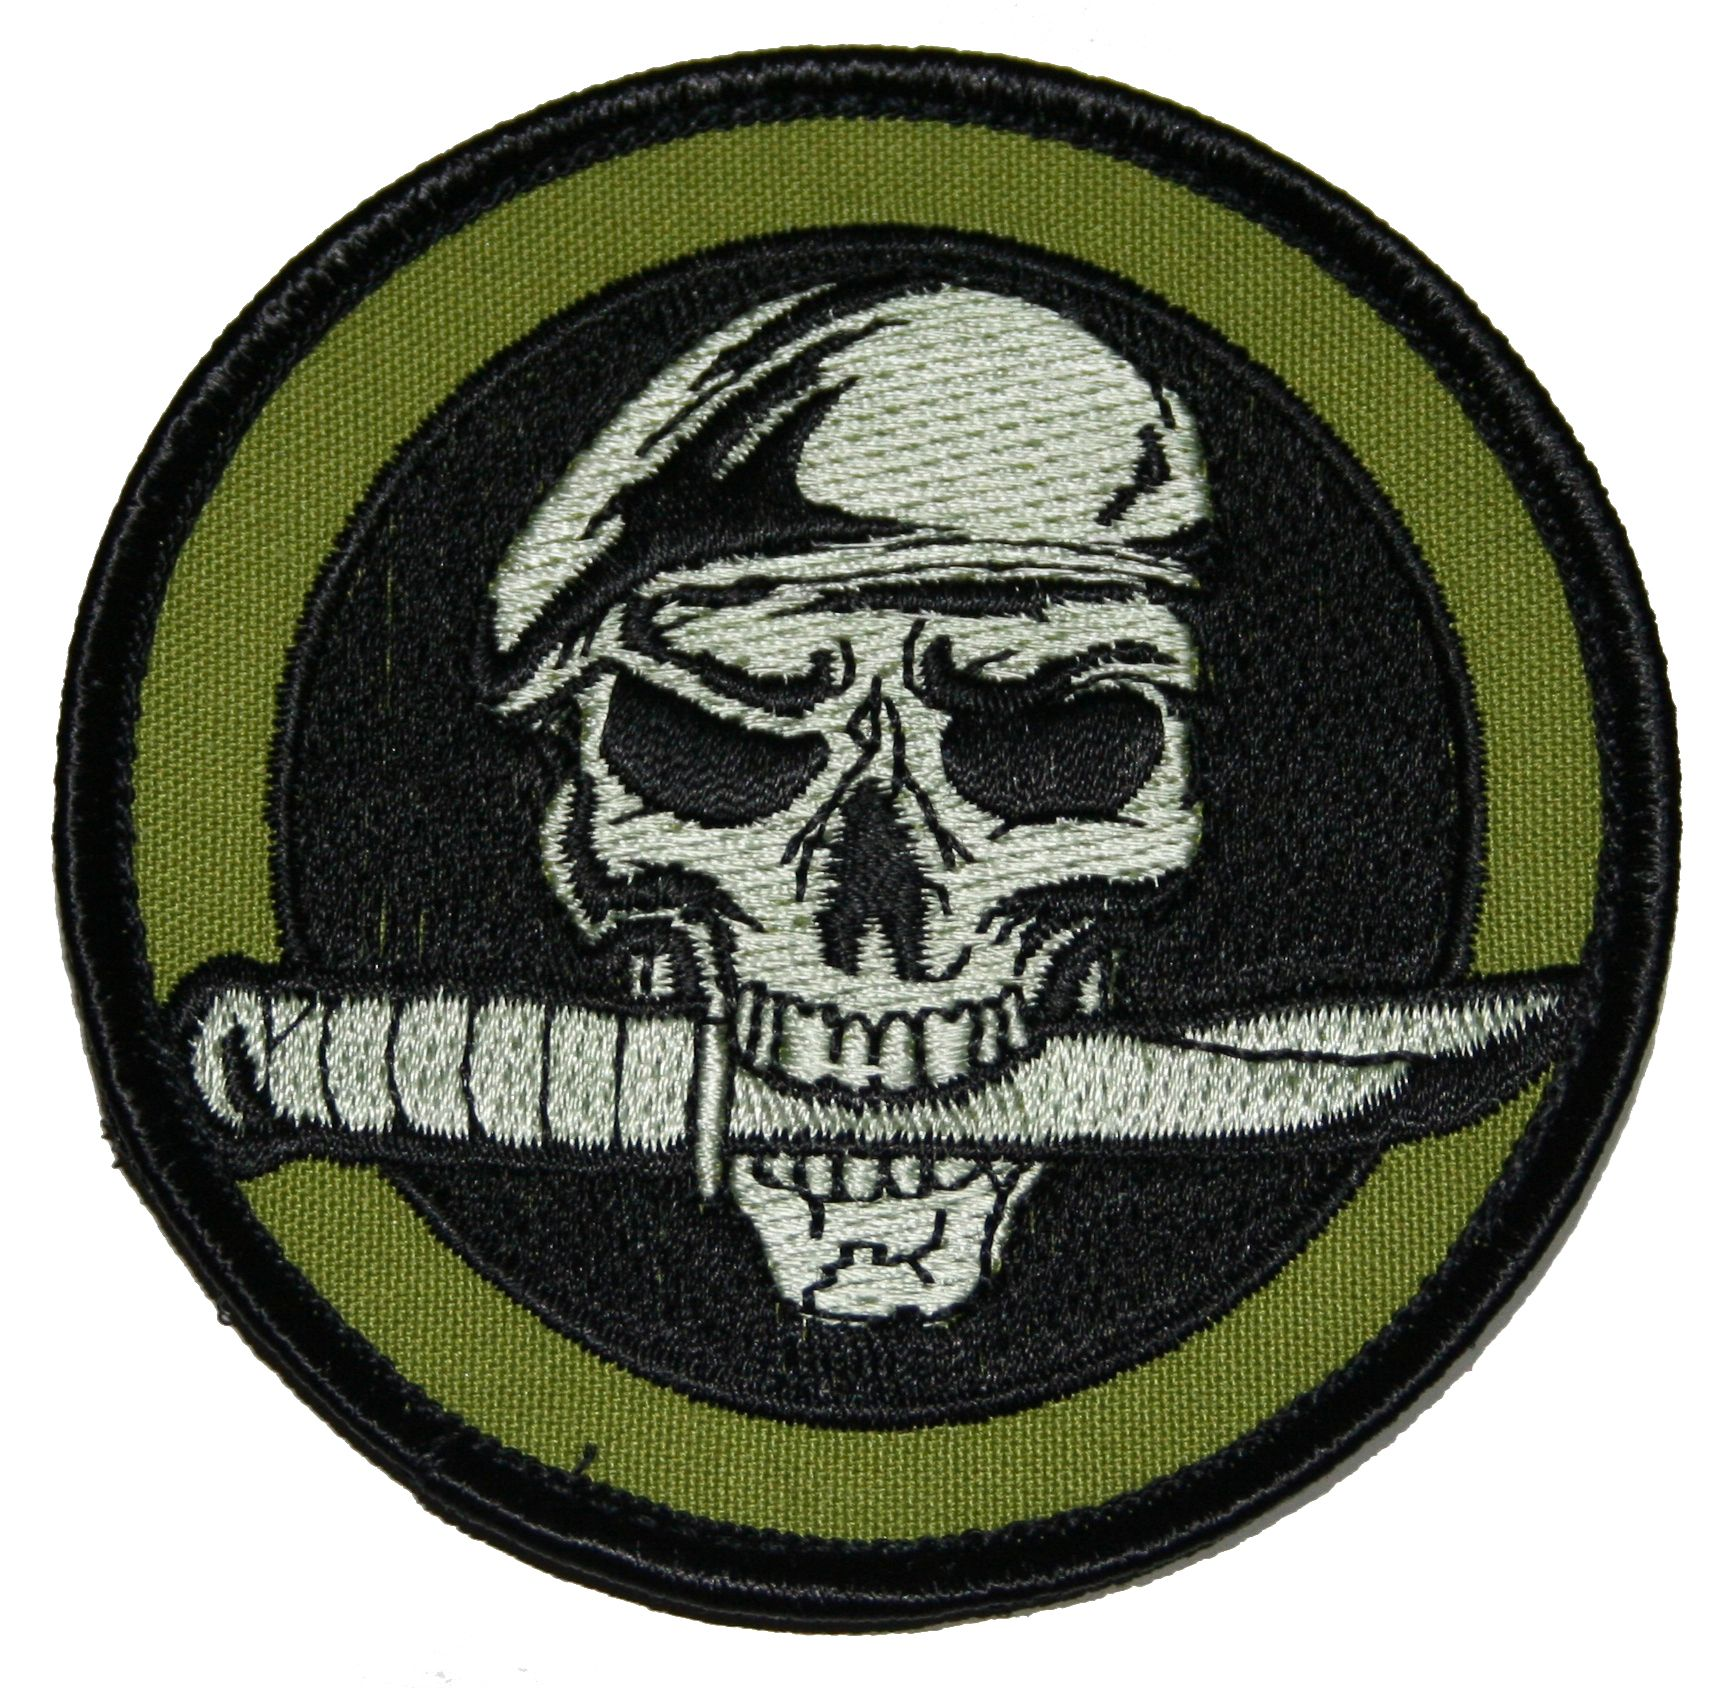 Parches militares productos americanos usa made in usa for Imagenes de productos americanos